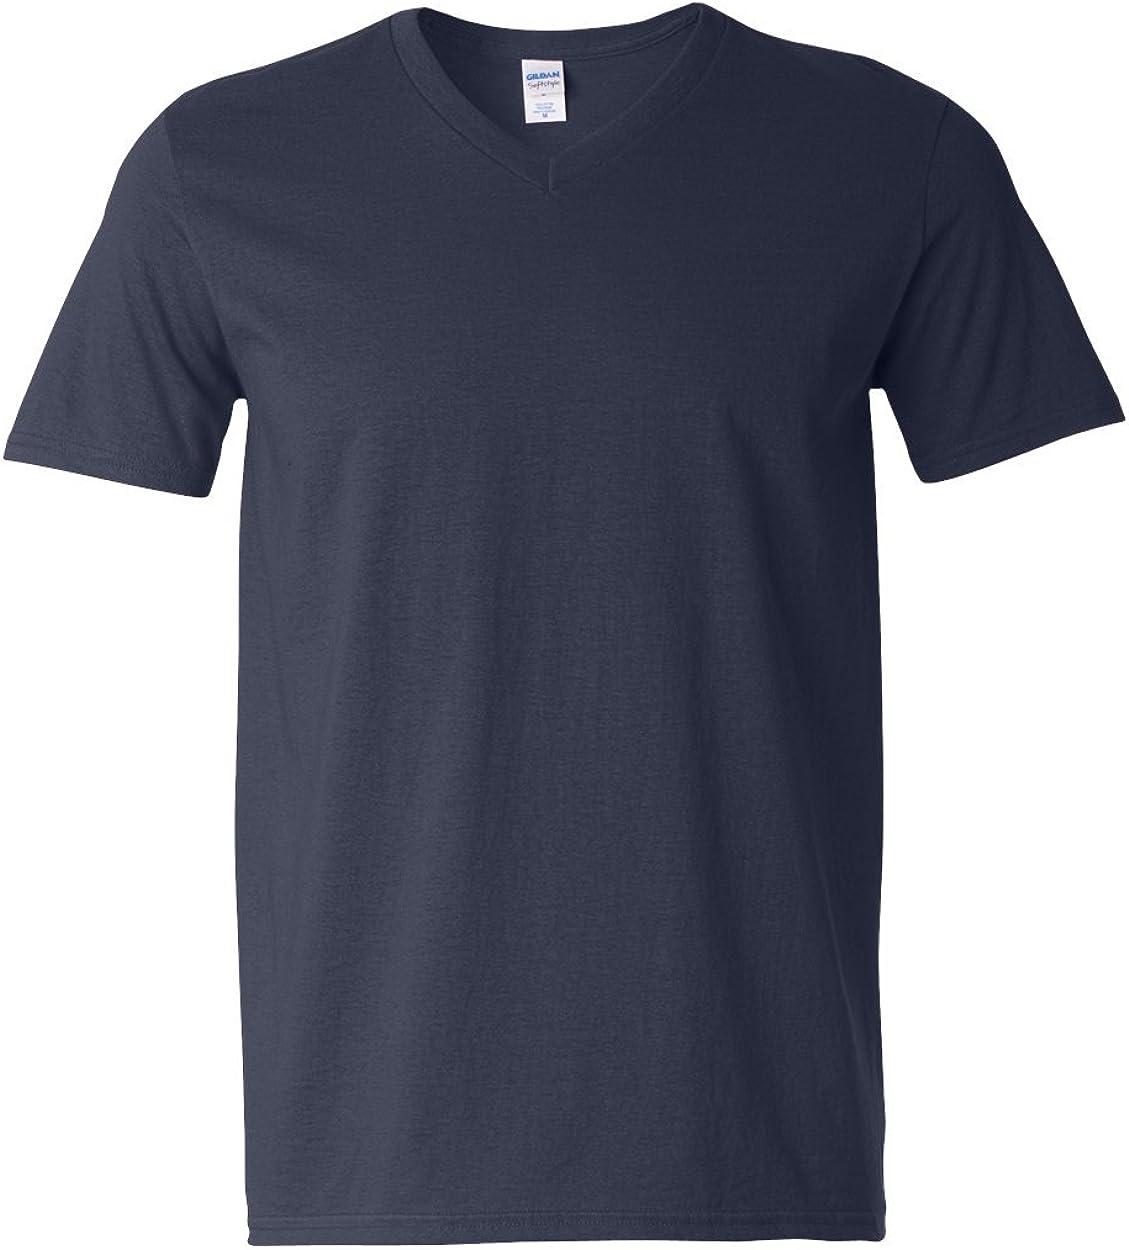 Gildan G64V 4.5 Oz Softstyle V-Neck T-Shirt